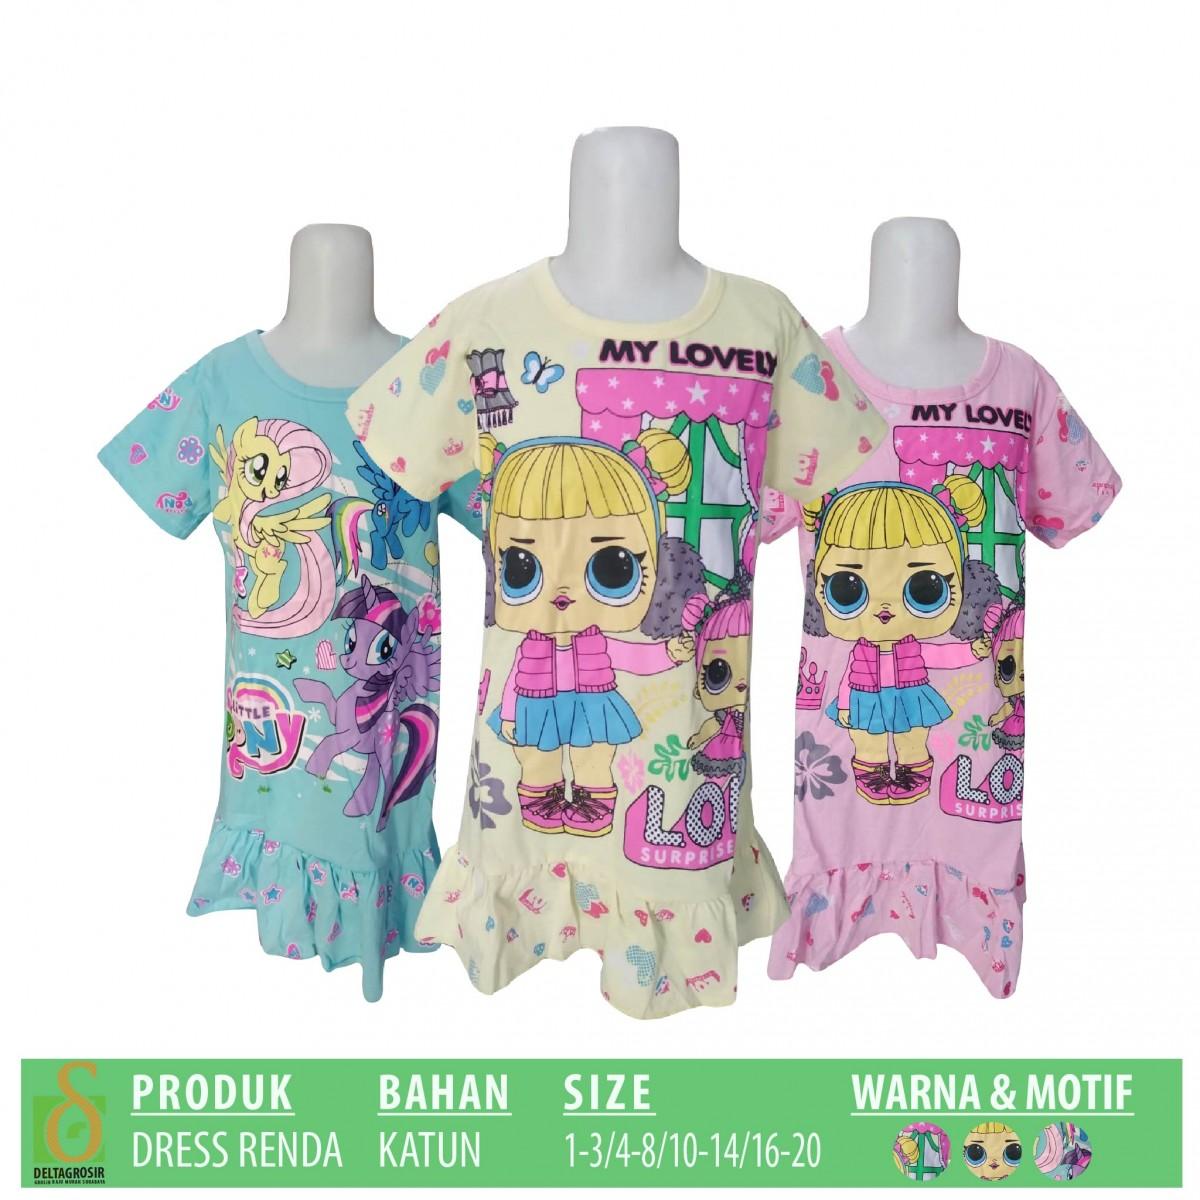 Grosir Dress Renda Anak Murah di Surabaya